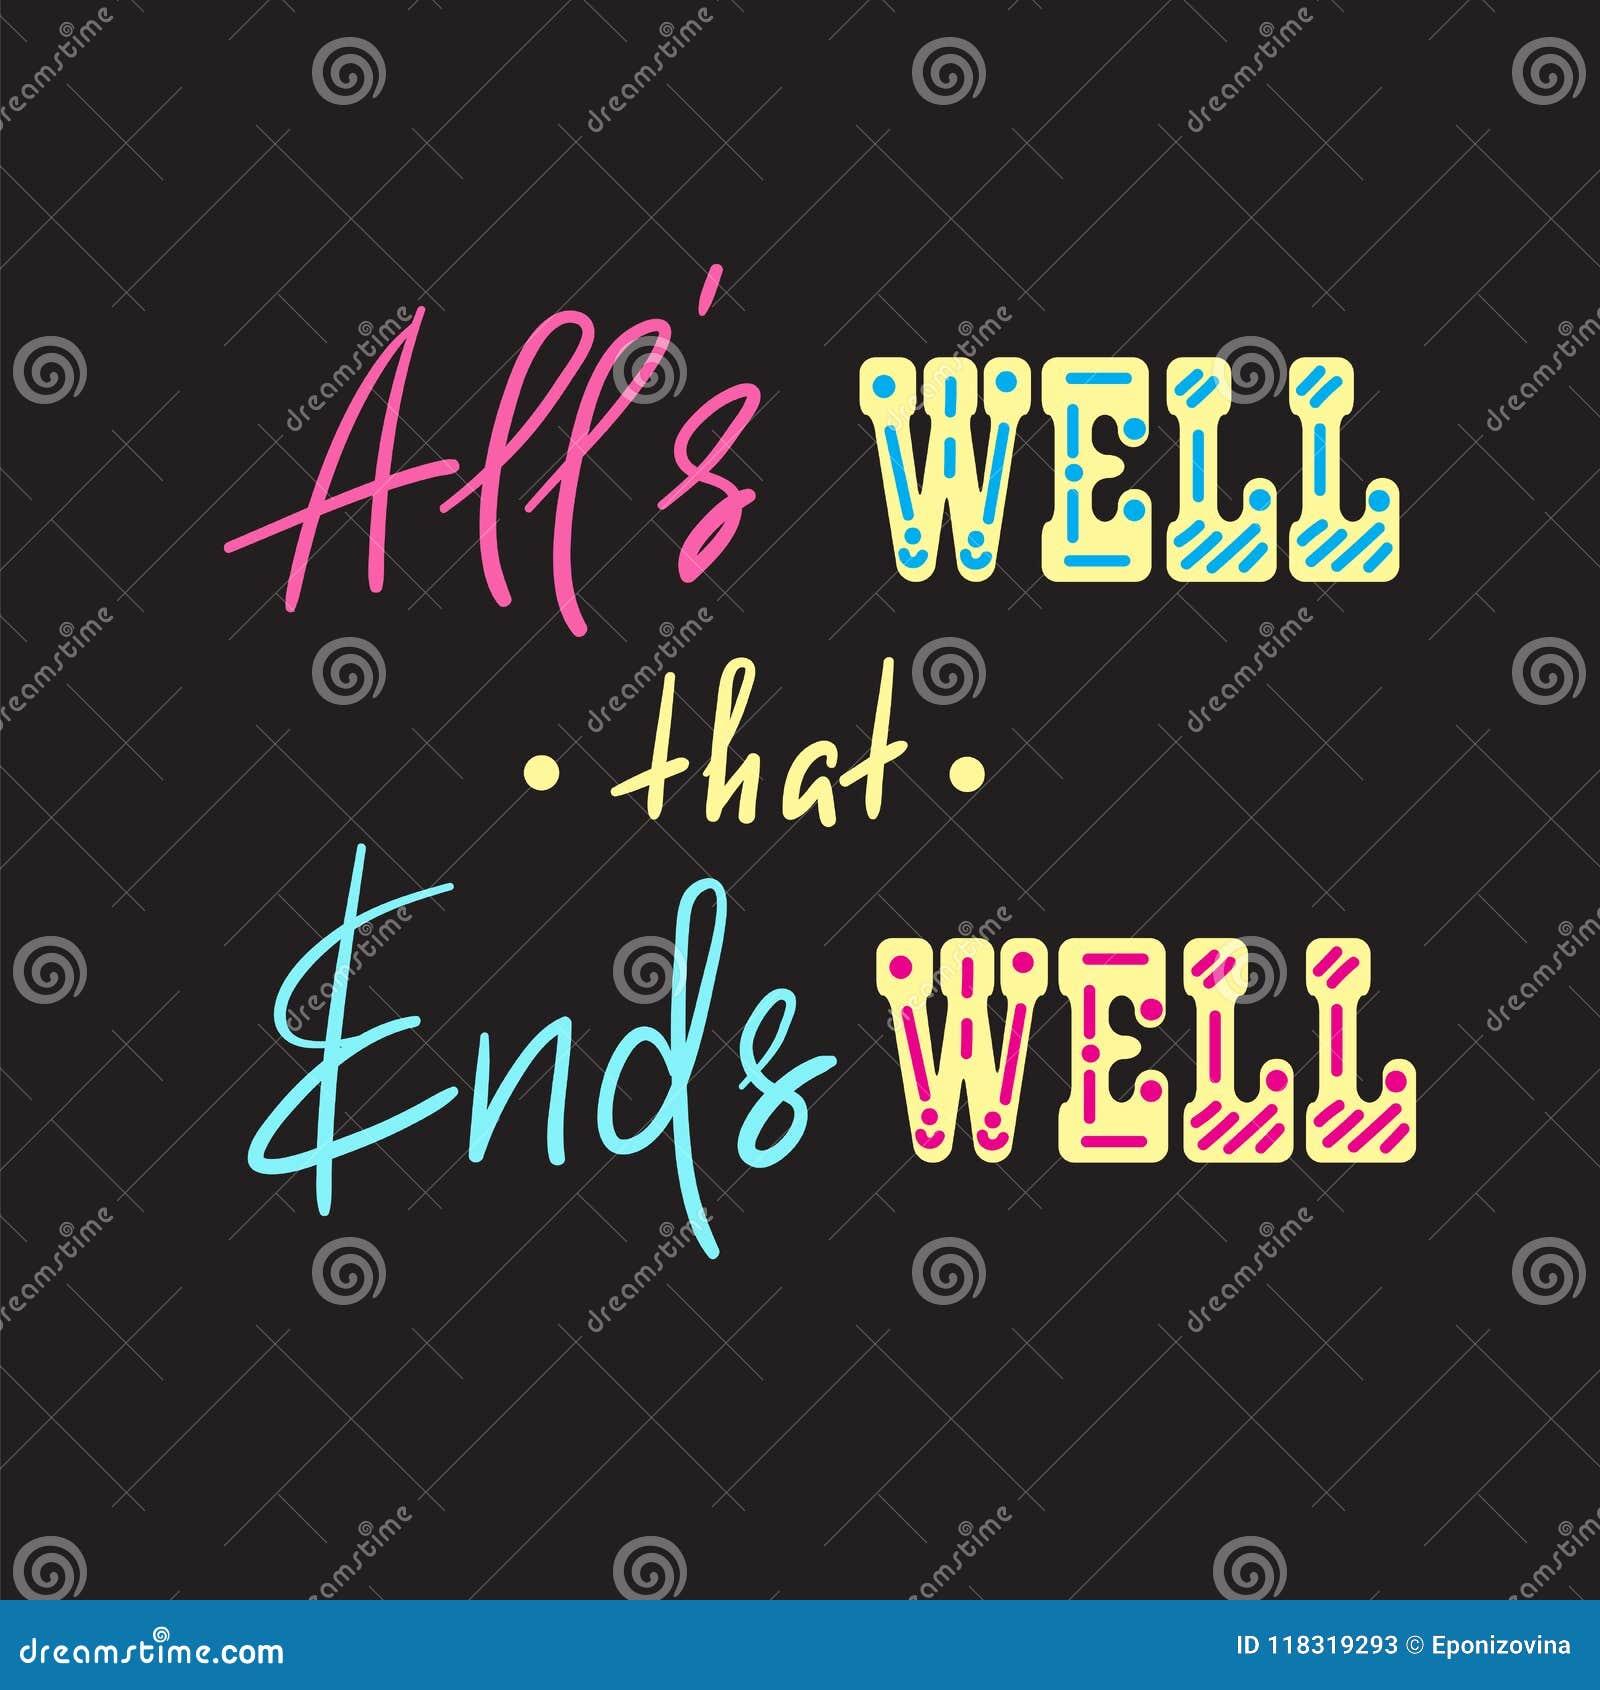 Alls Well That Ends Well Handwritten Motivational Quote